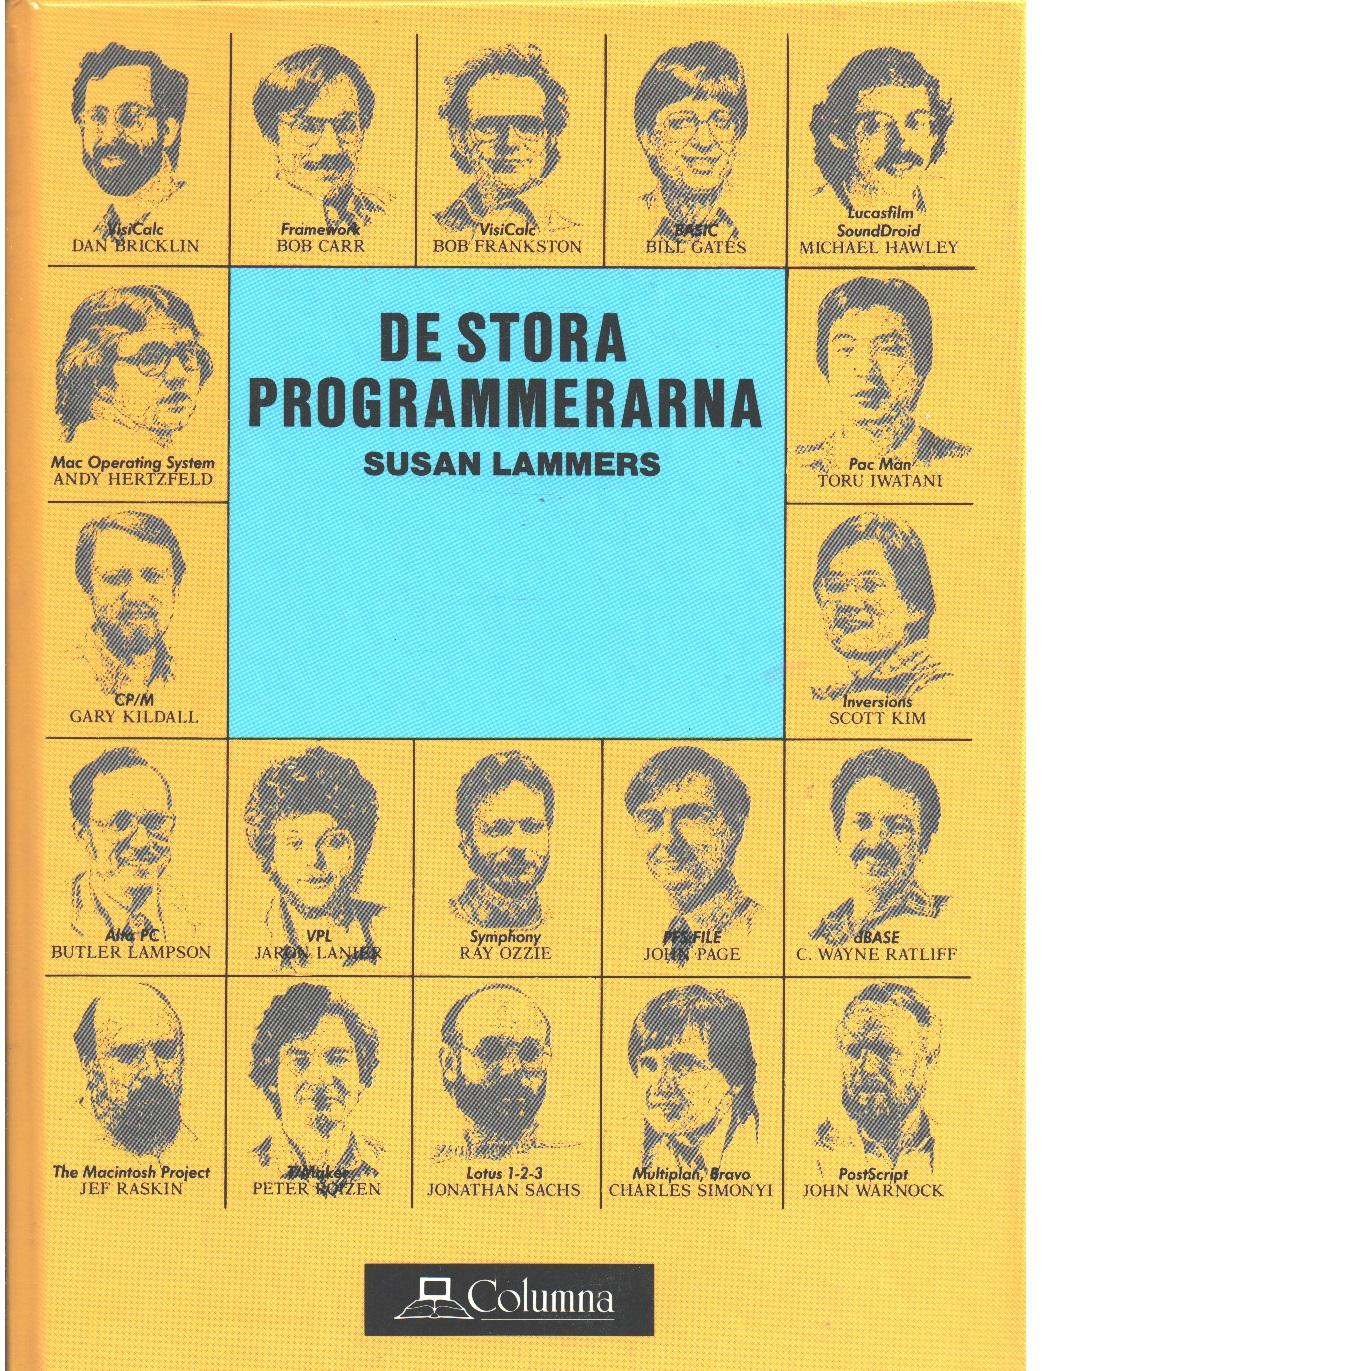 De stora programmerarna - Lammers, Susan